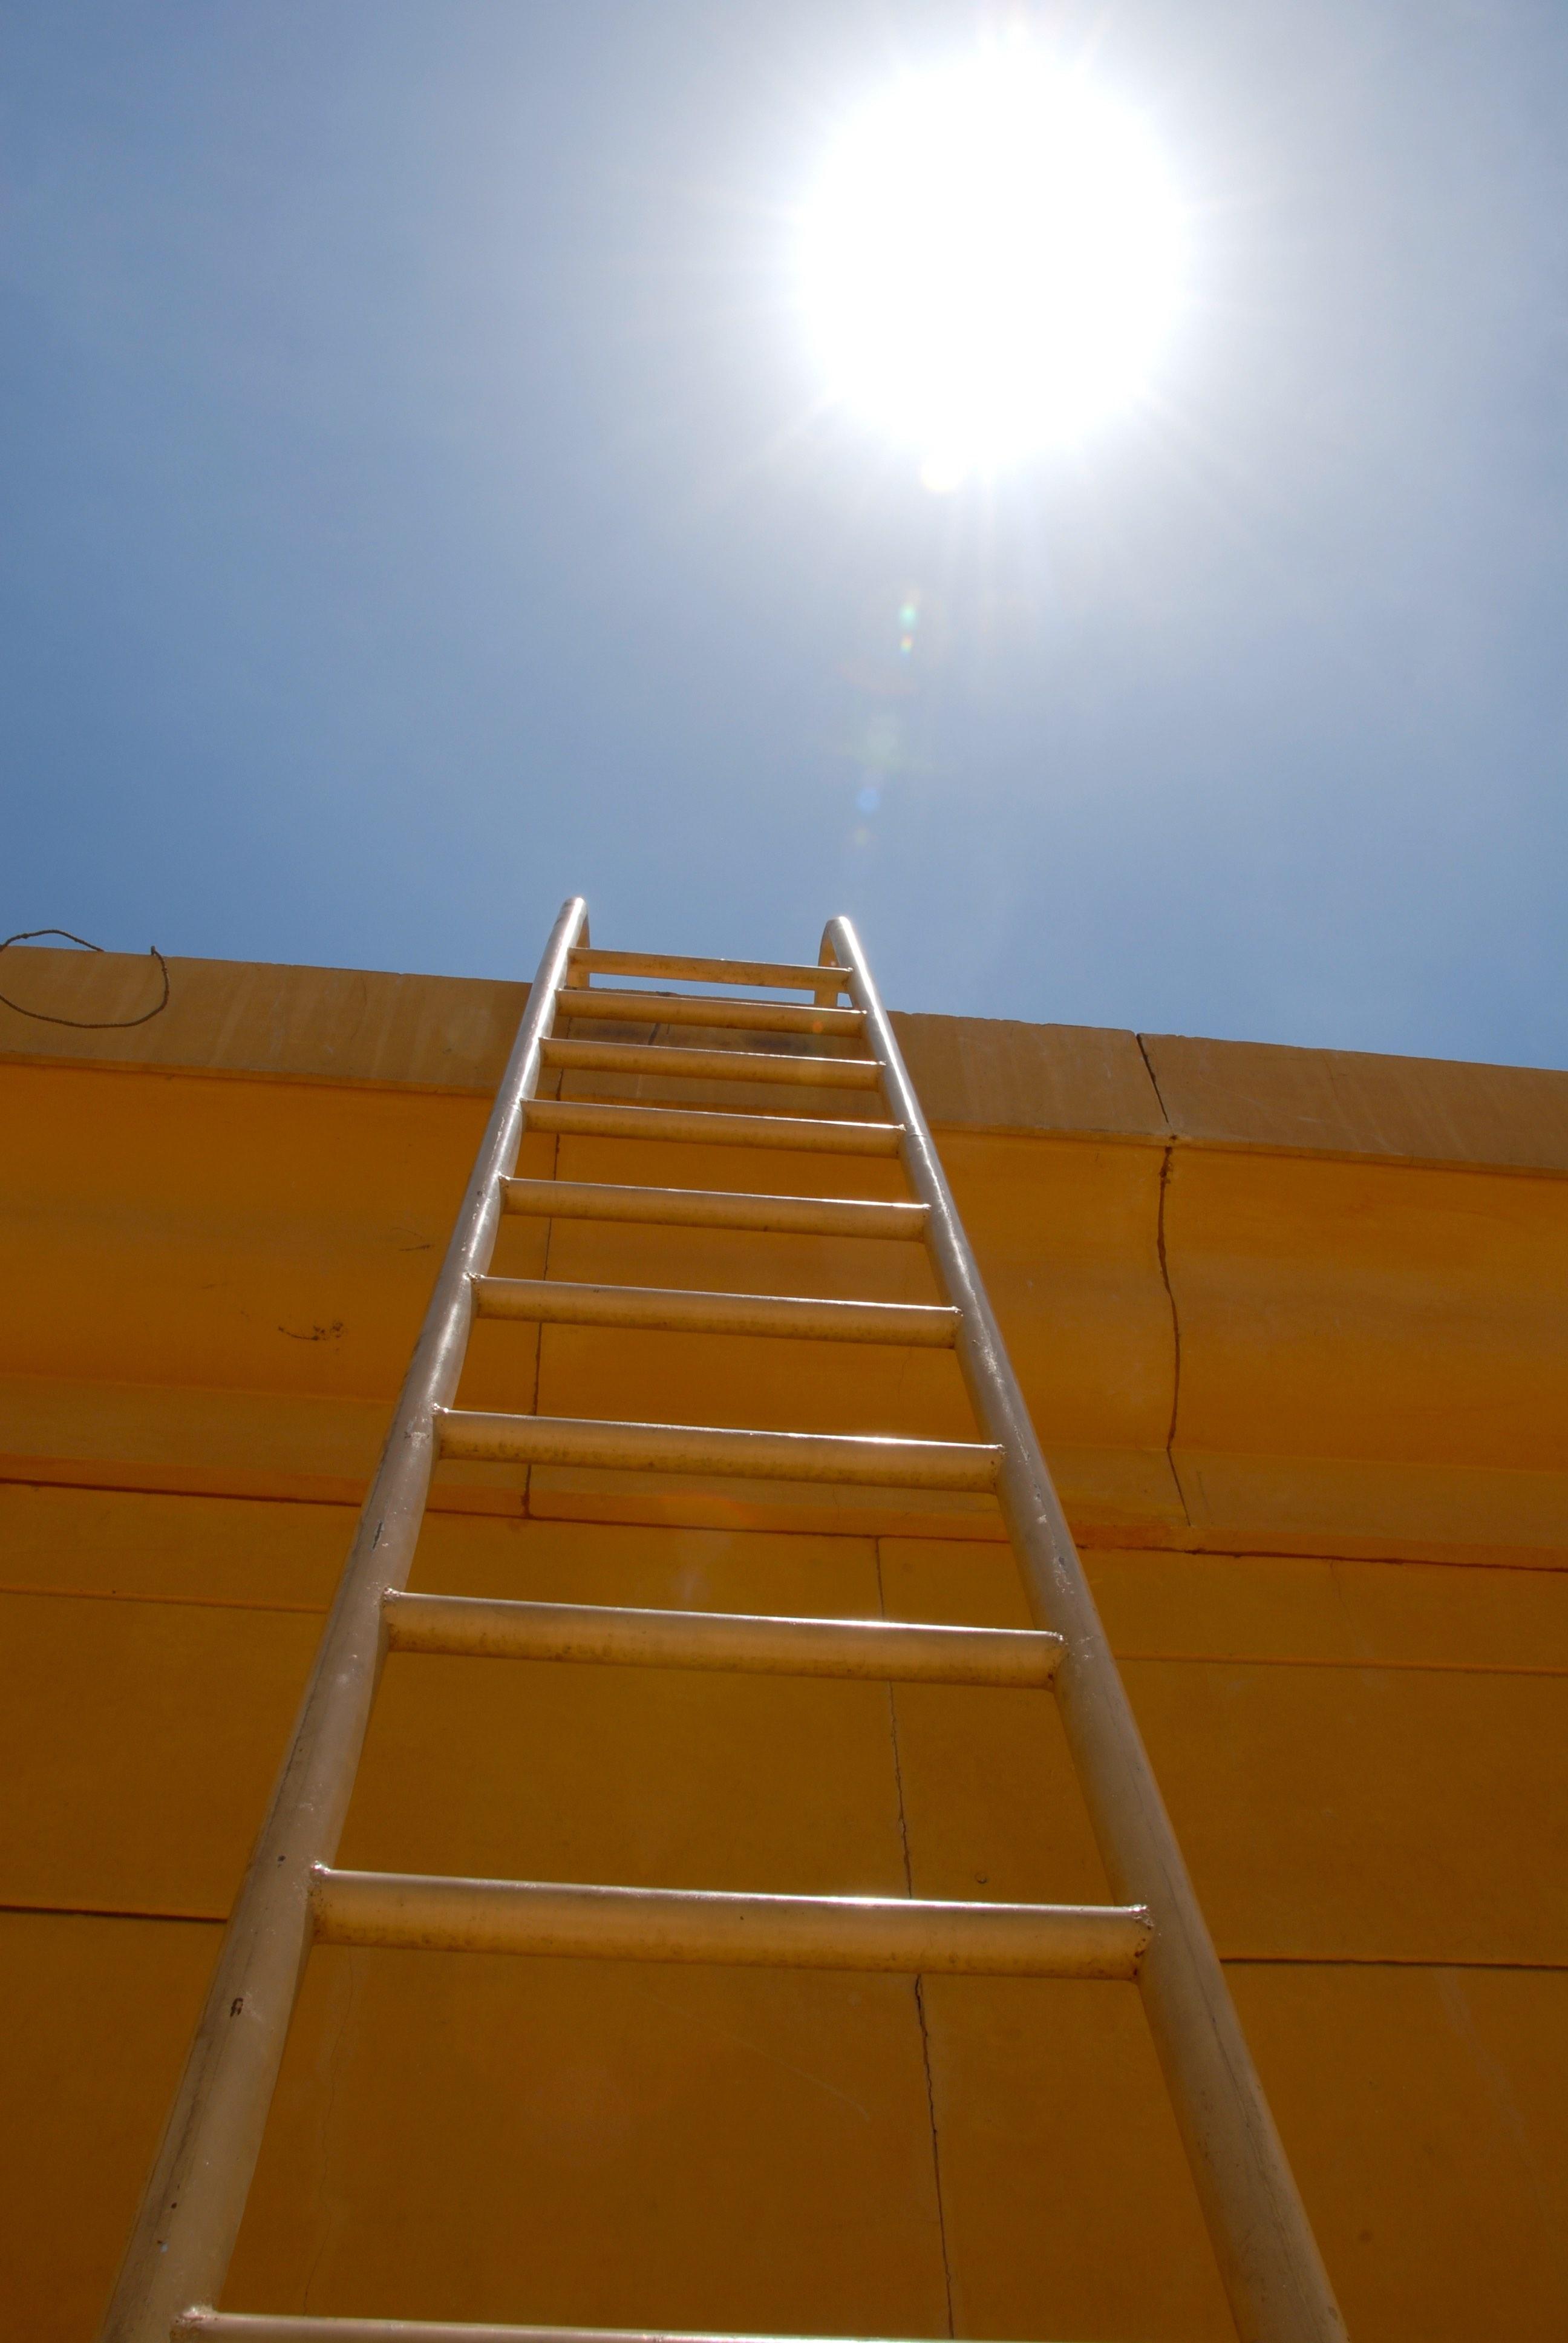 Ladder smaller